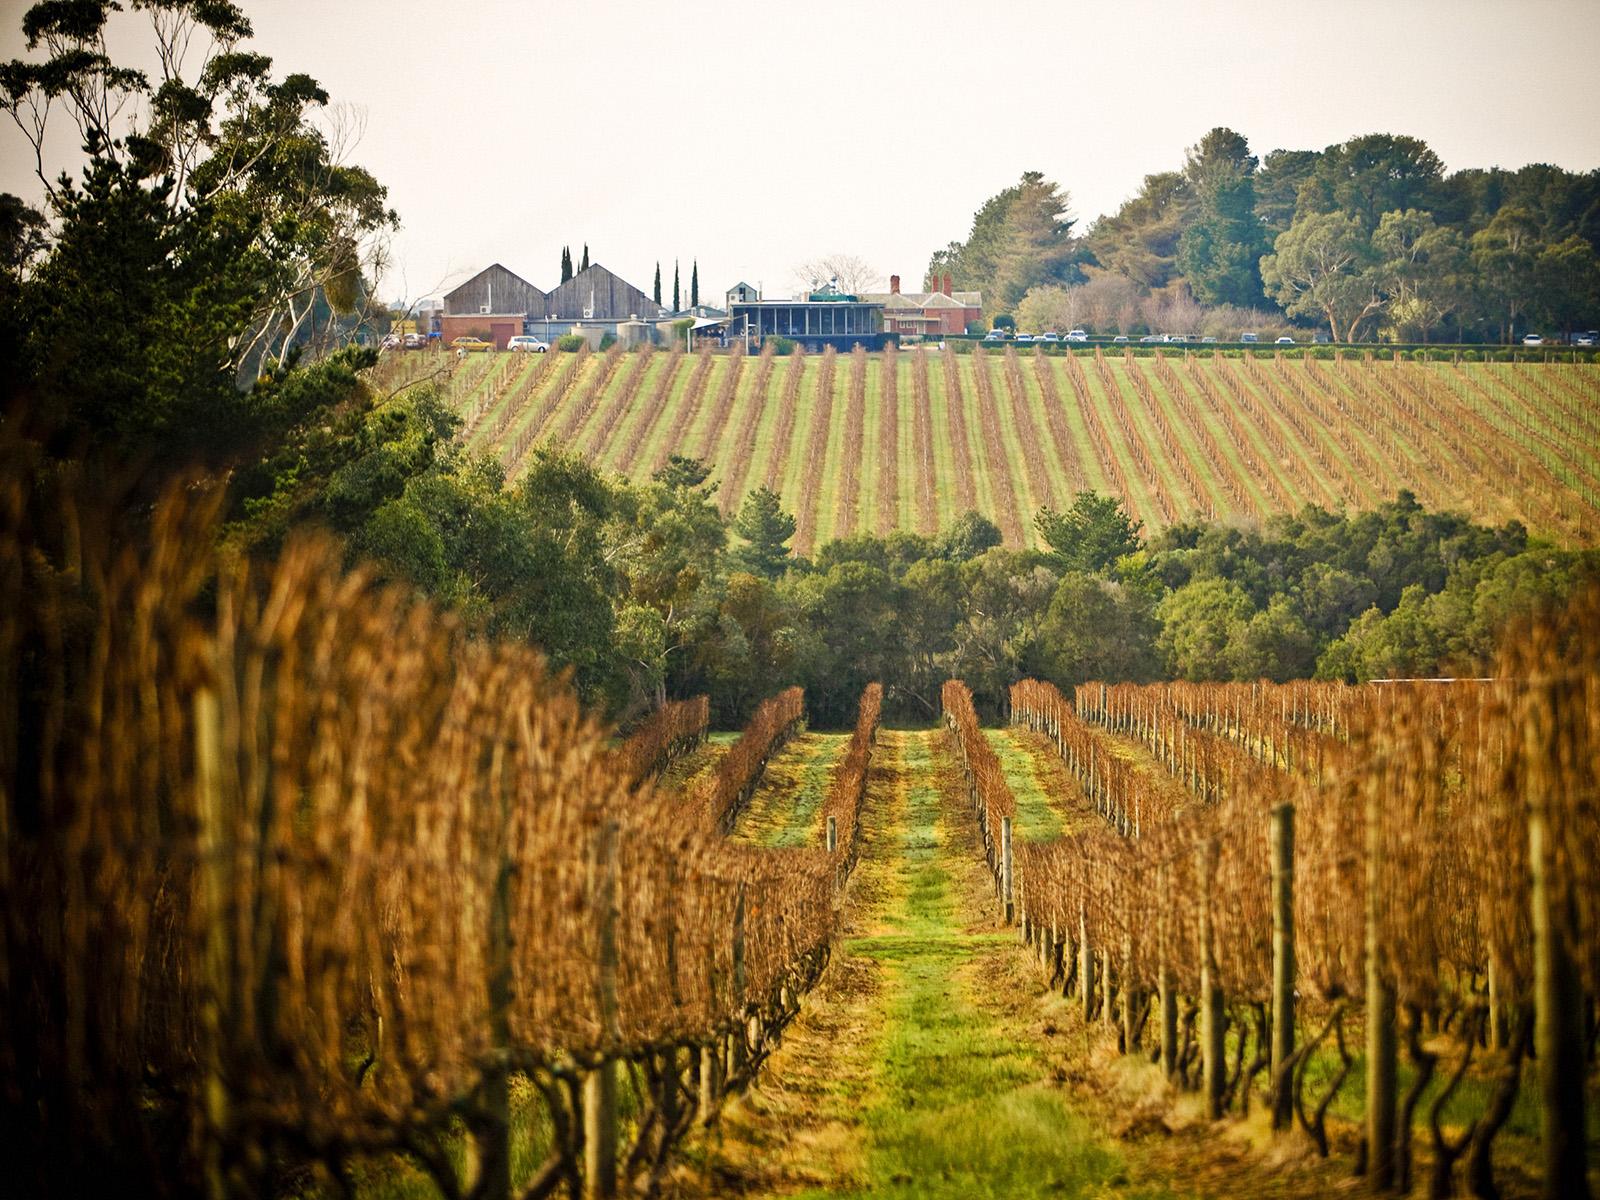 Willow Creek Vineyard, Mornington Peninsula, Victoria. Photo by Adrian Lander.